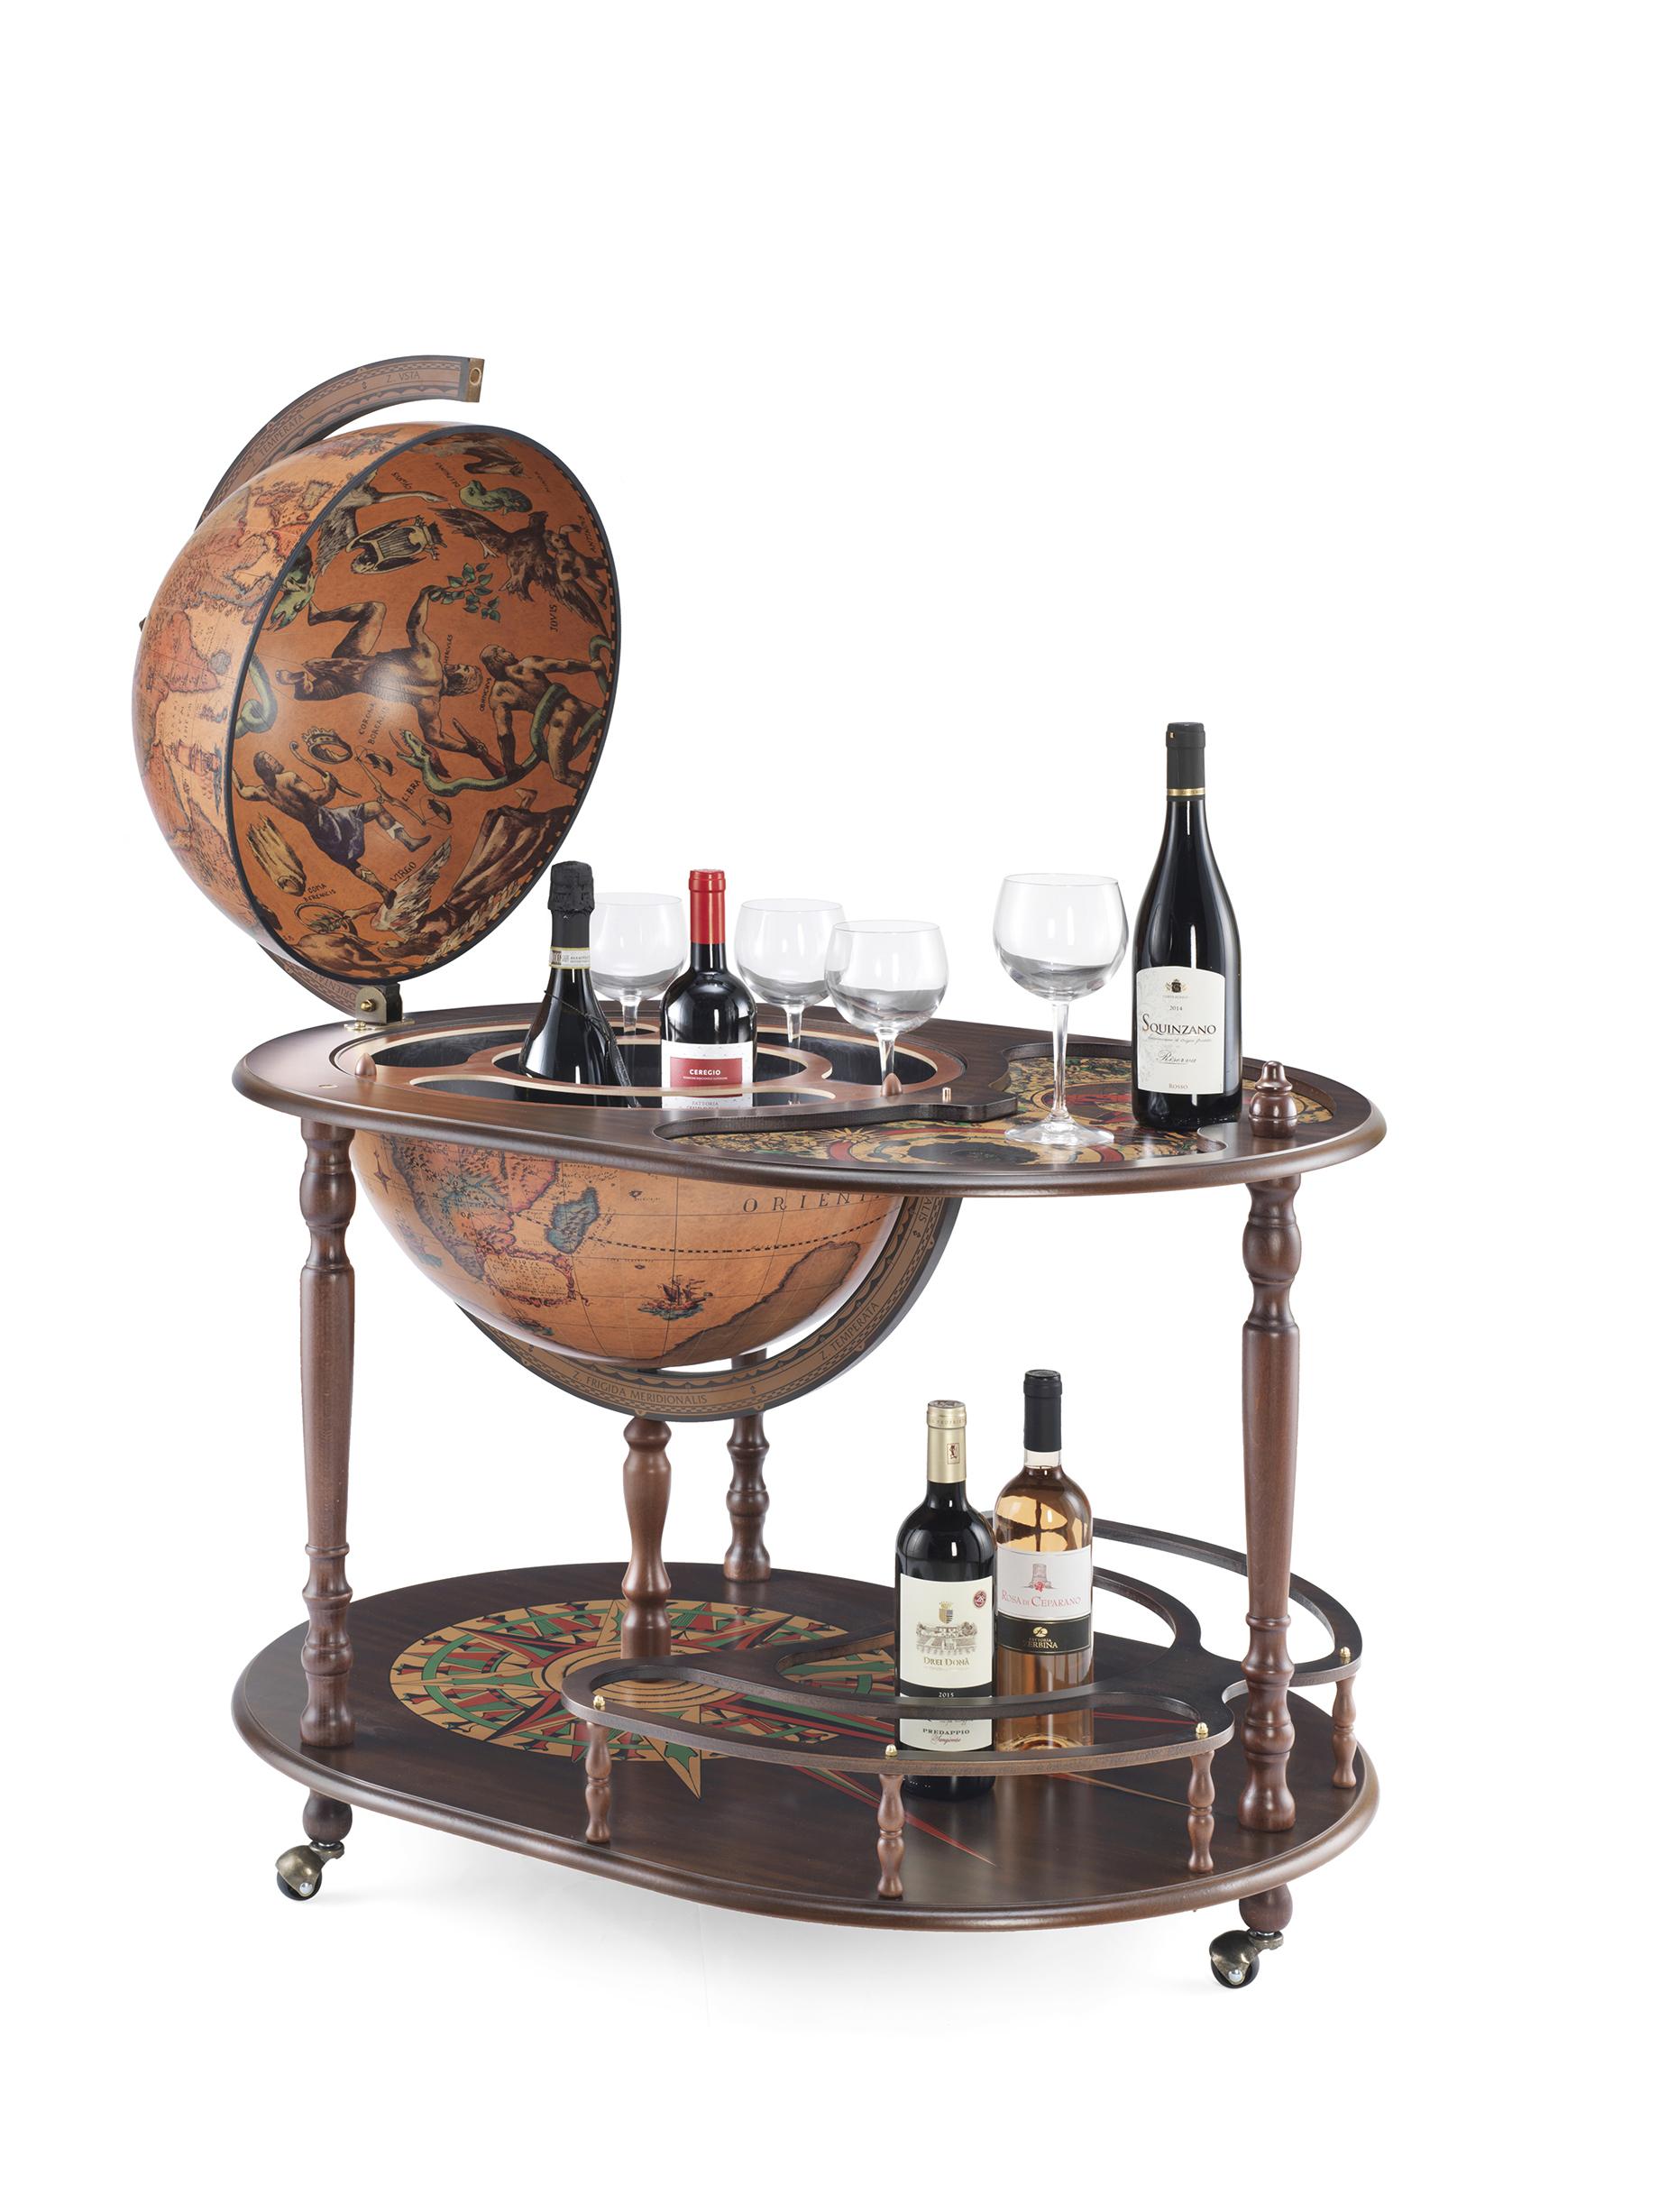 Artemide bar globe 50 Classic - 16e-eeuwse kaart